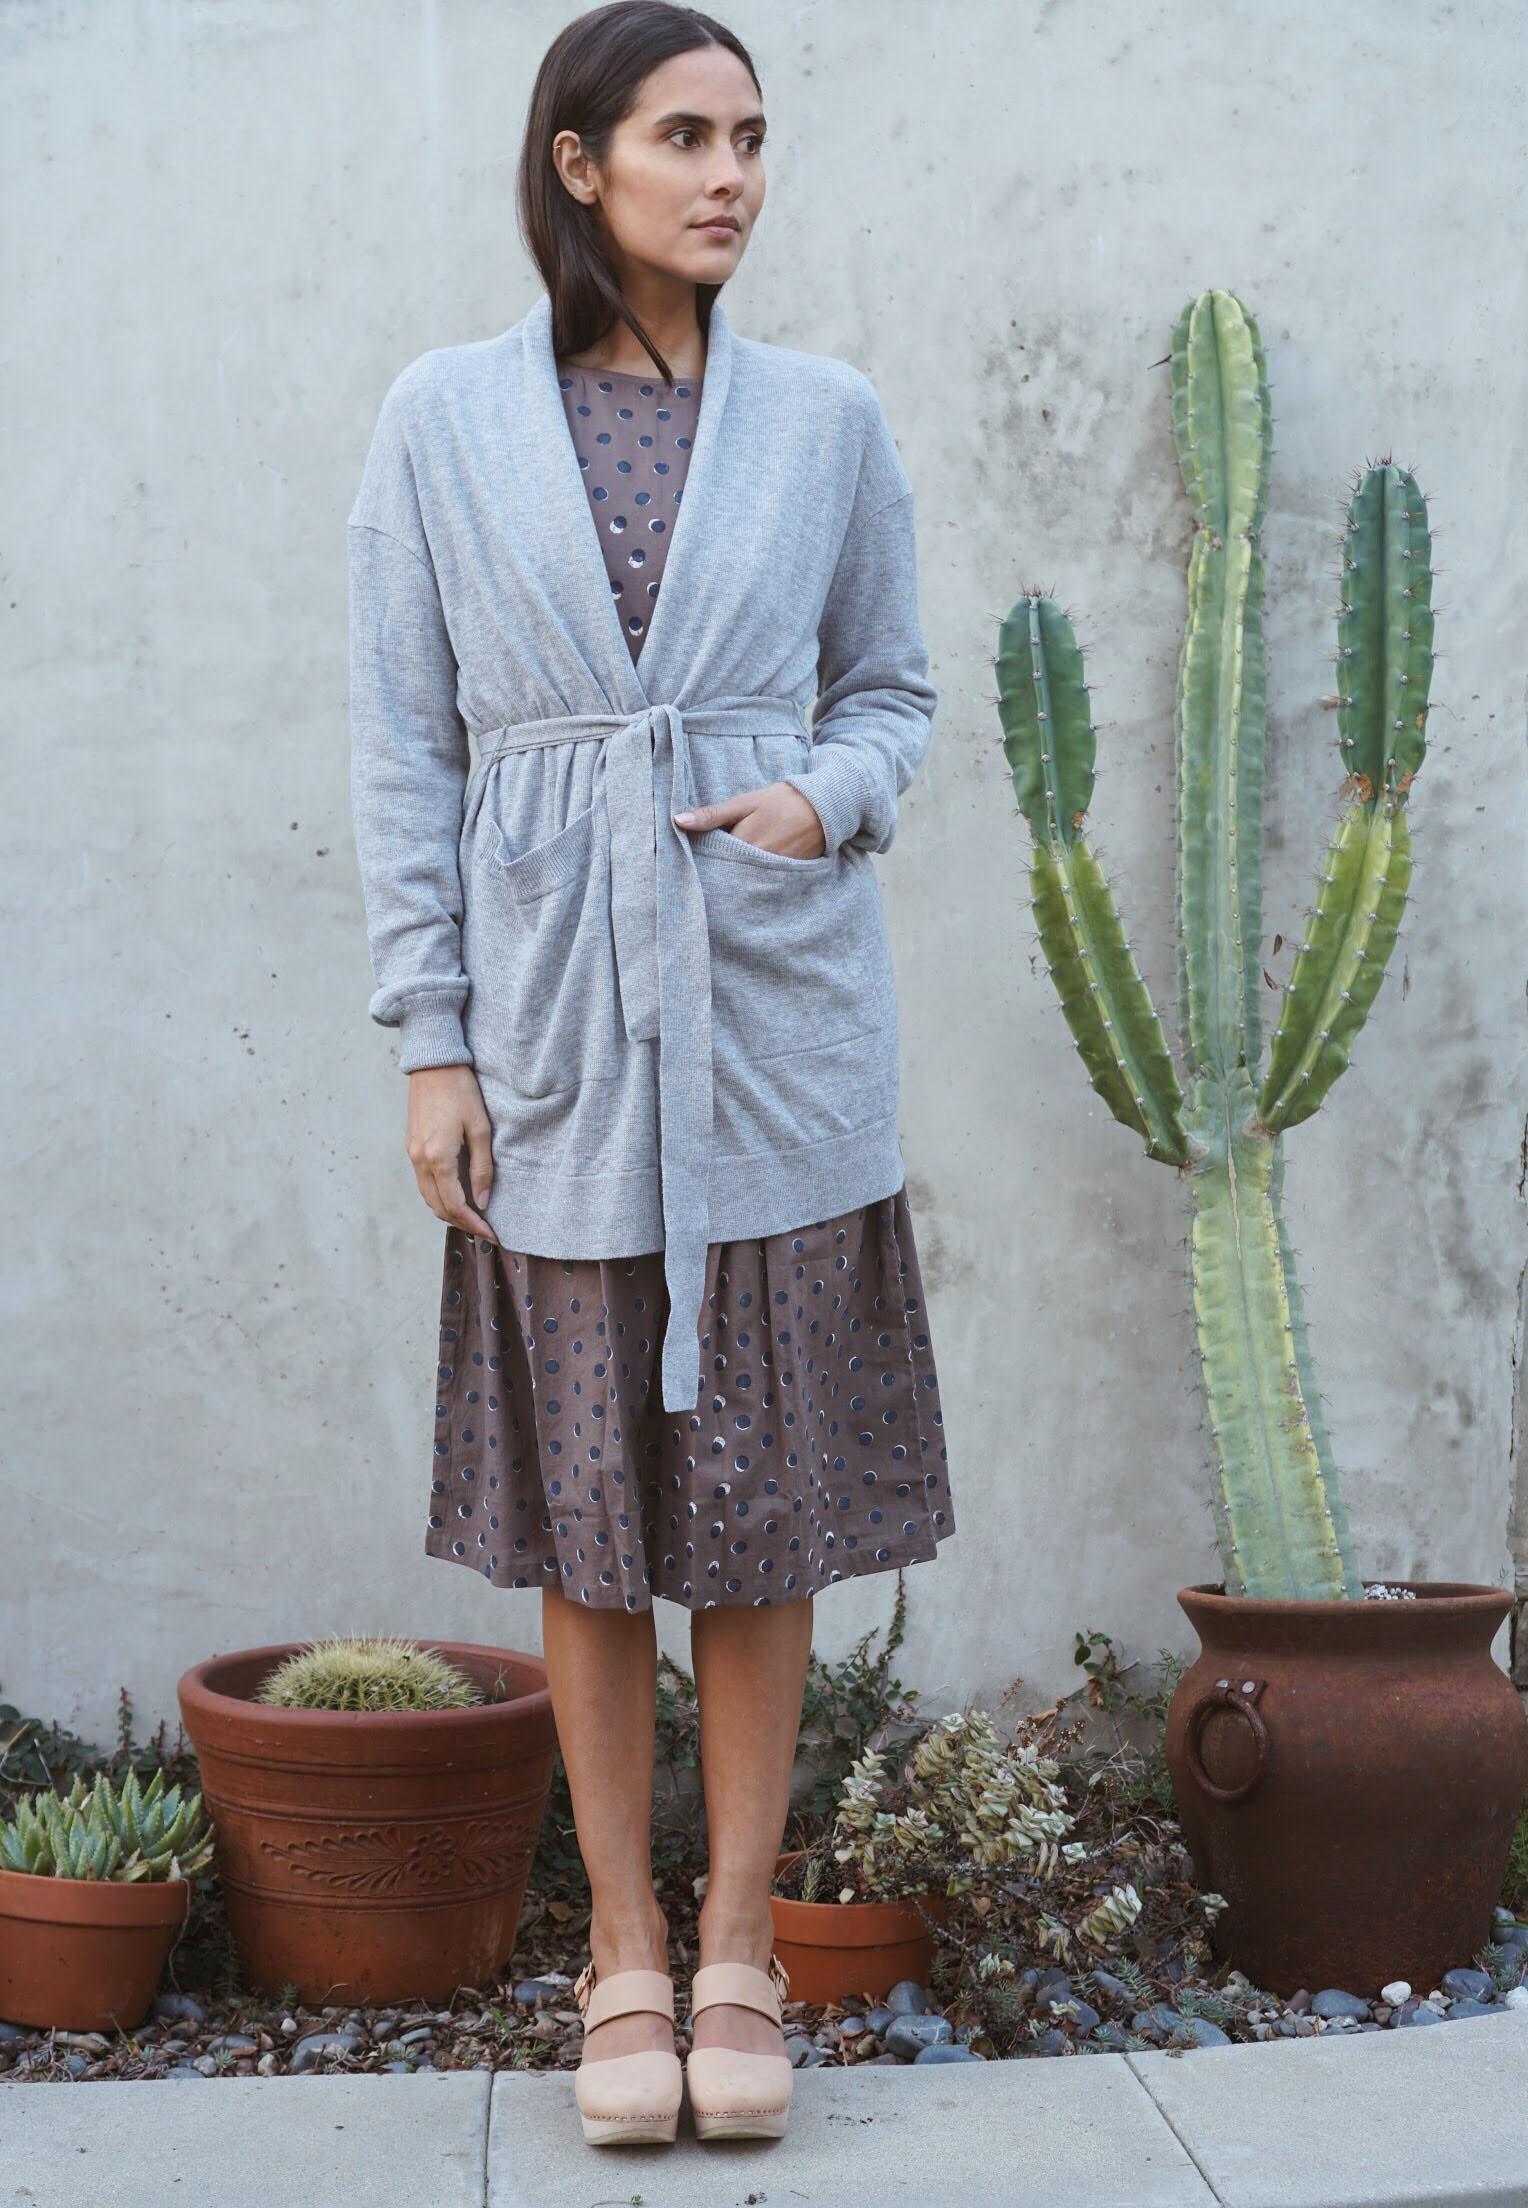 Kopal  Kuku Dress in Block Polka +  Maiyet  Wrap Cardigan in Grey +   Zuzii   Closed Toe Clogs in Natural.